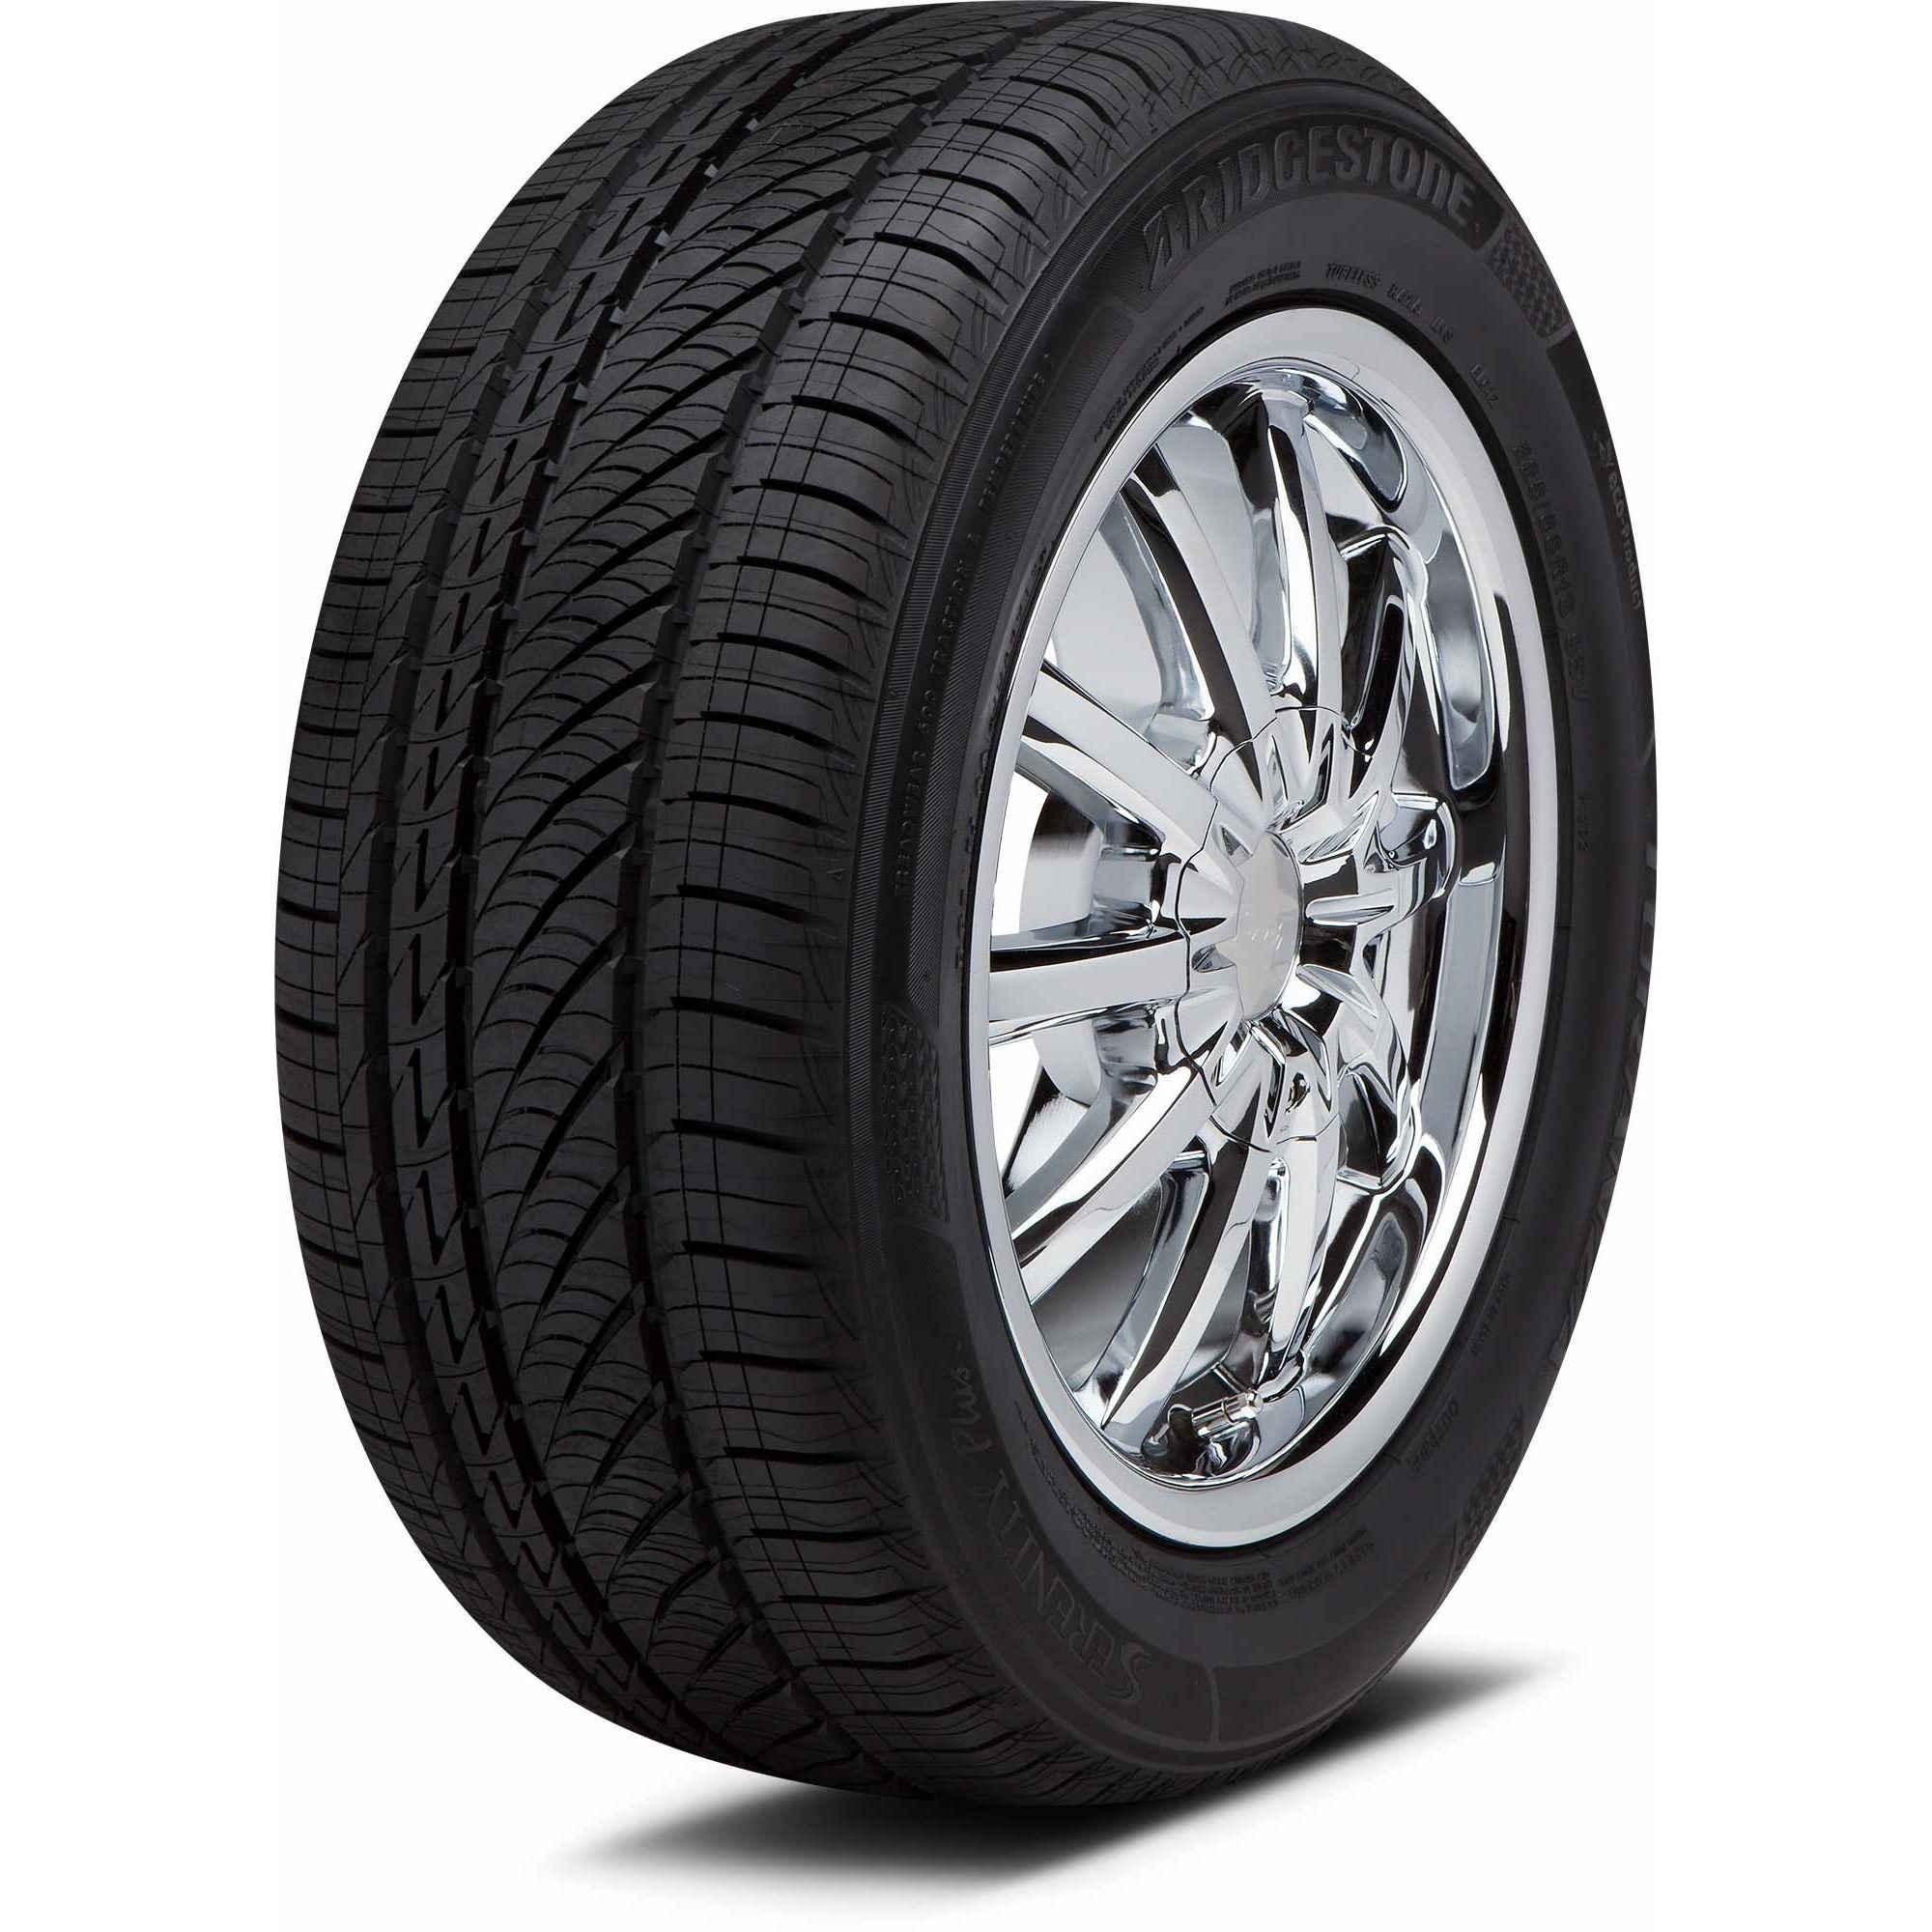 Bridgestone Turanza Serenity Plus 205 55 R16 91 V ...